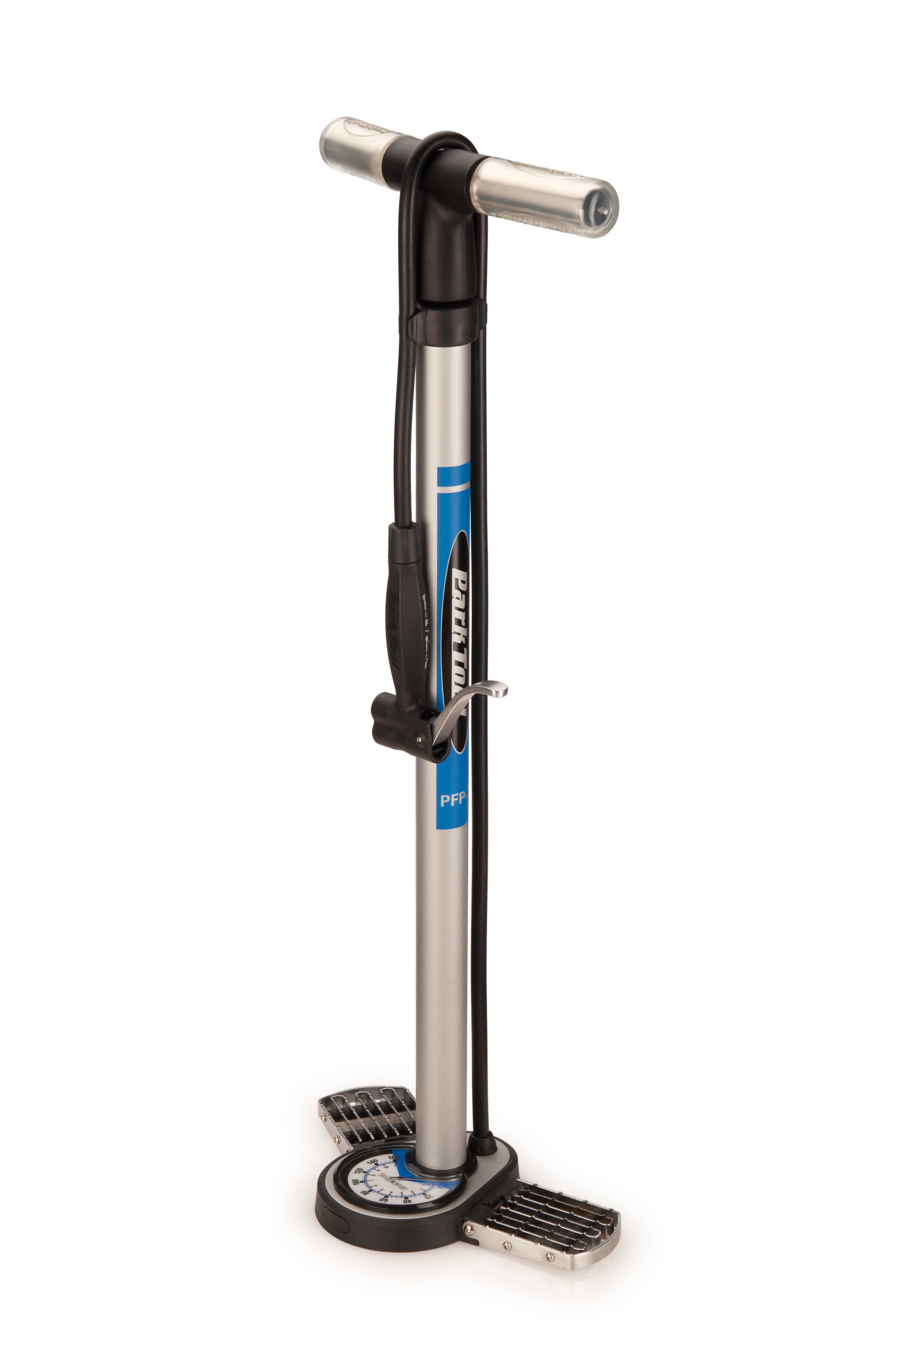 The Park Tool PFP-7 Professional Mechanic Floor Pump, enlarged